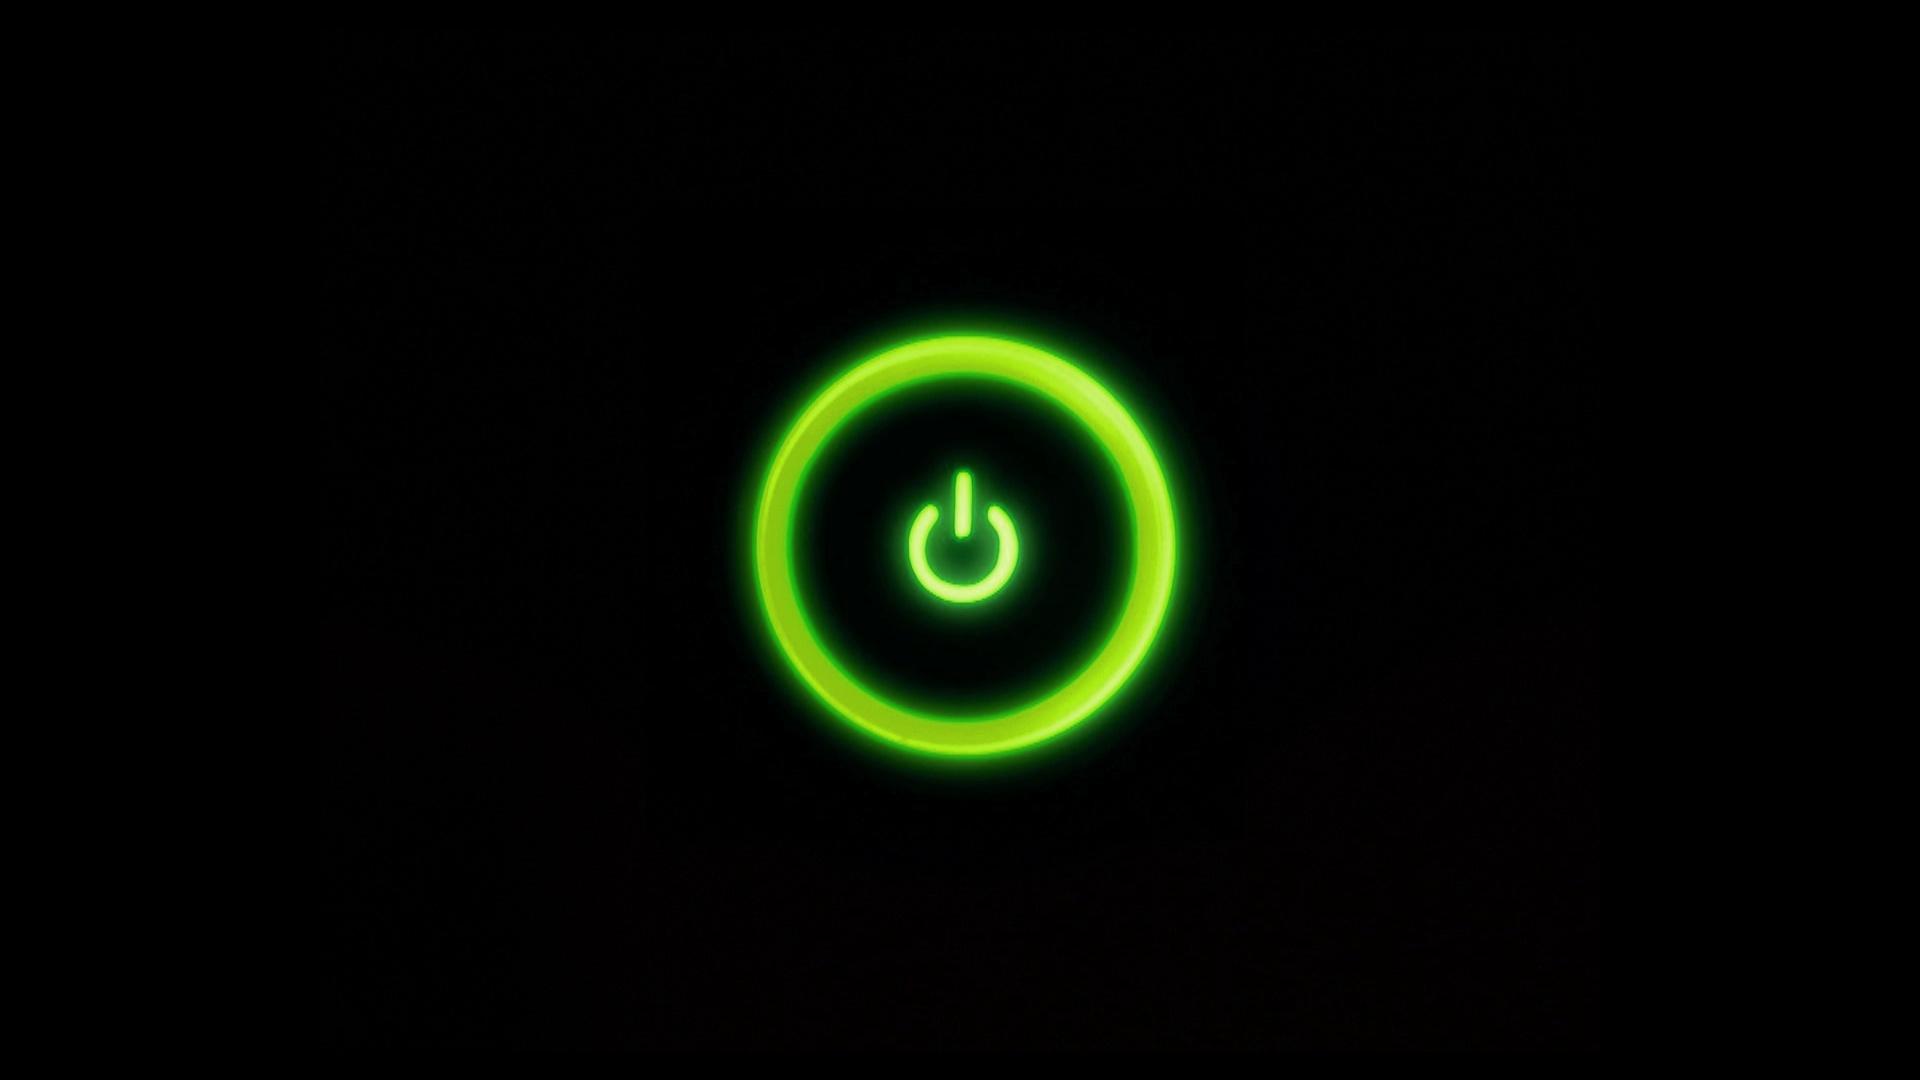 green, power button, xbox 360 - free wallpaper / wallpaperjam